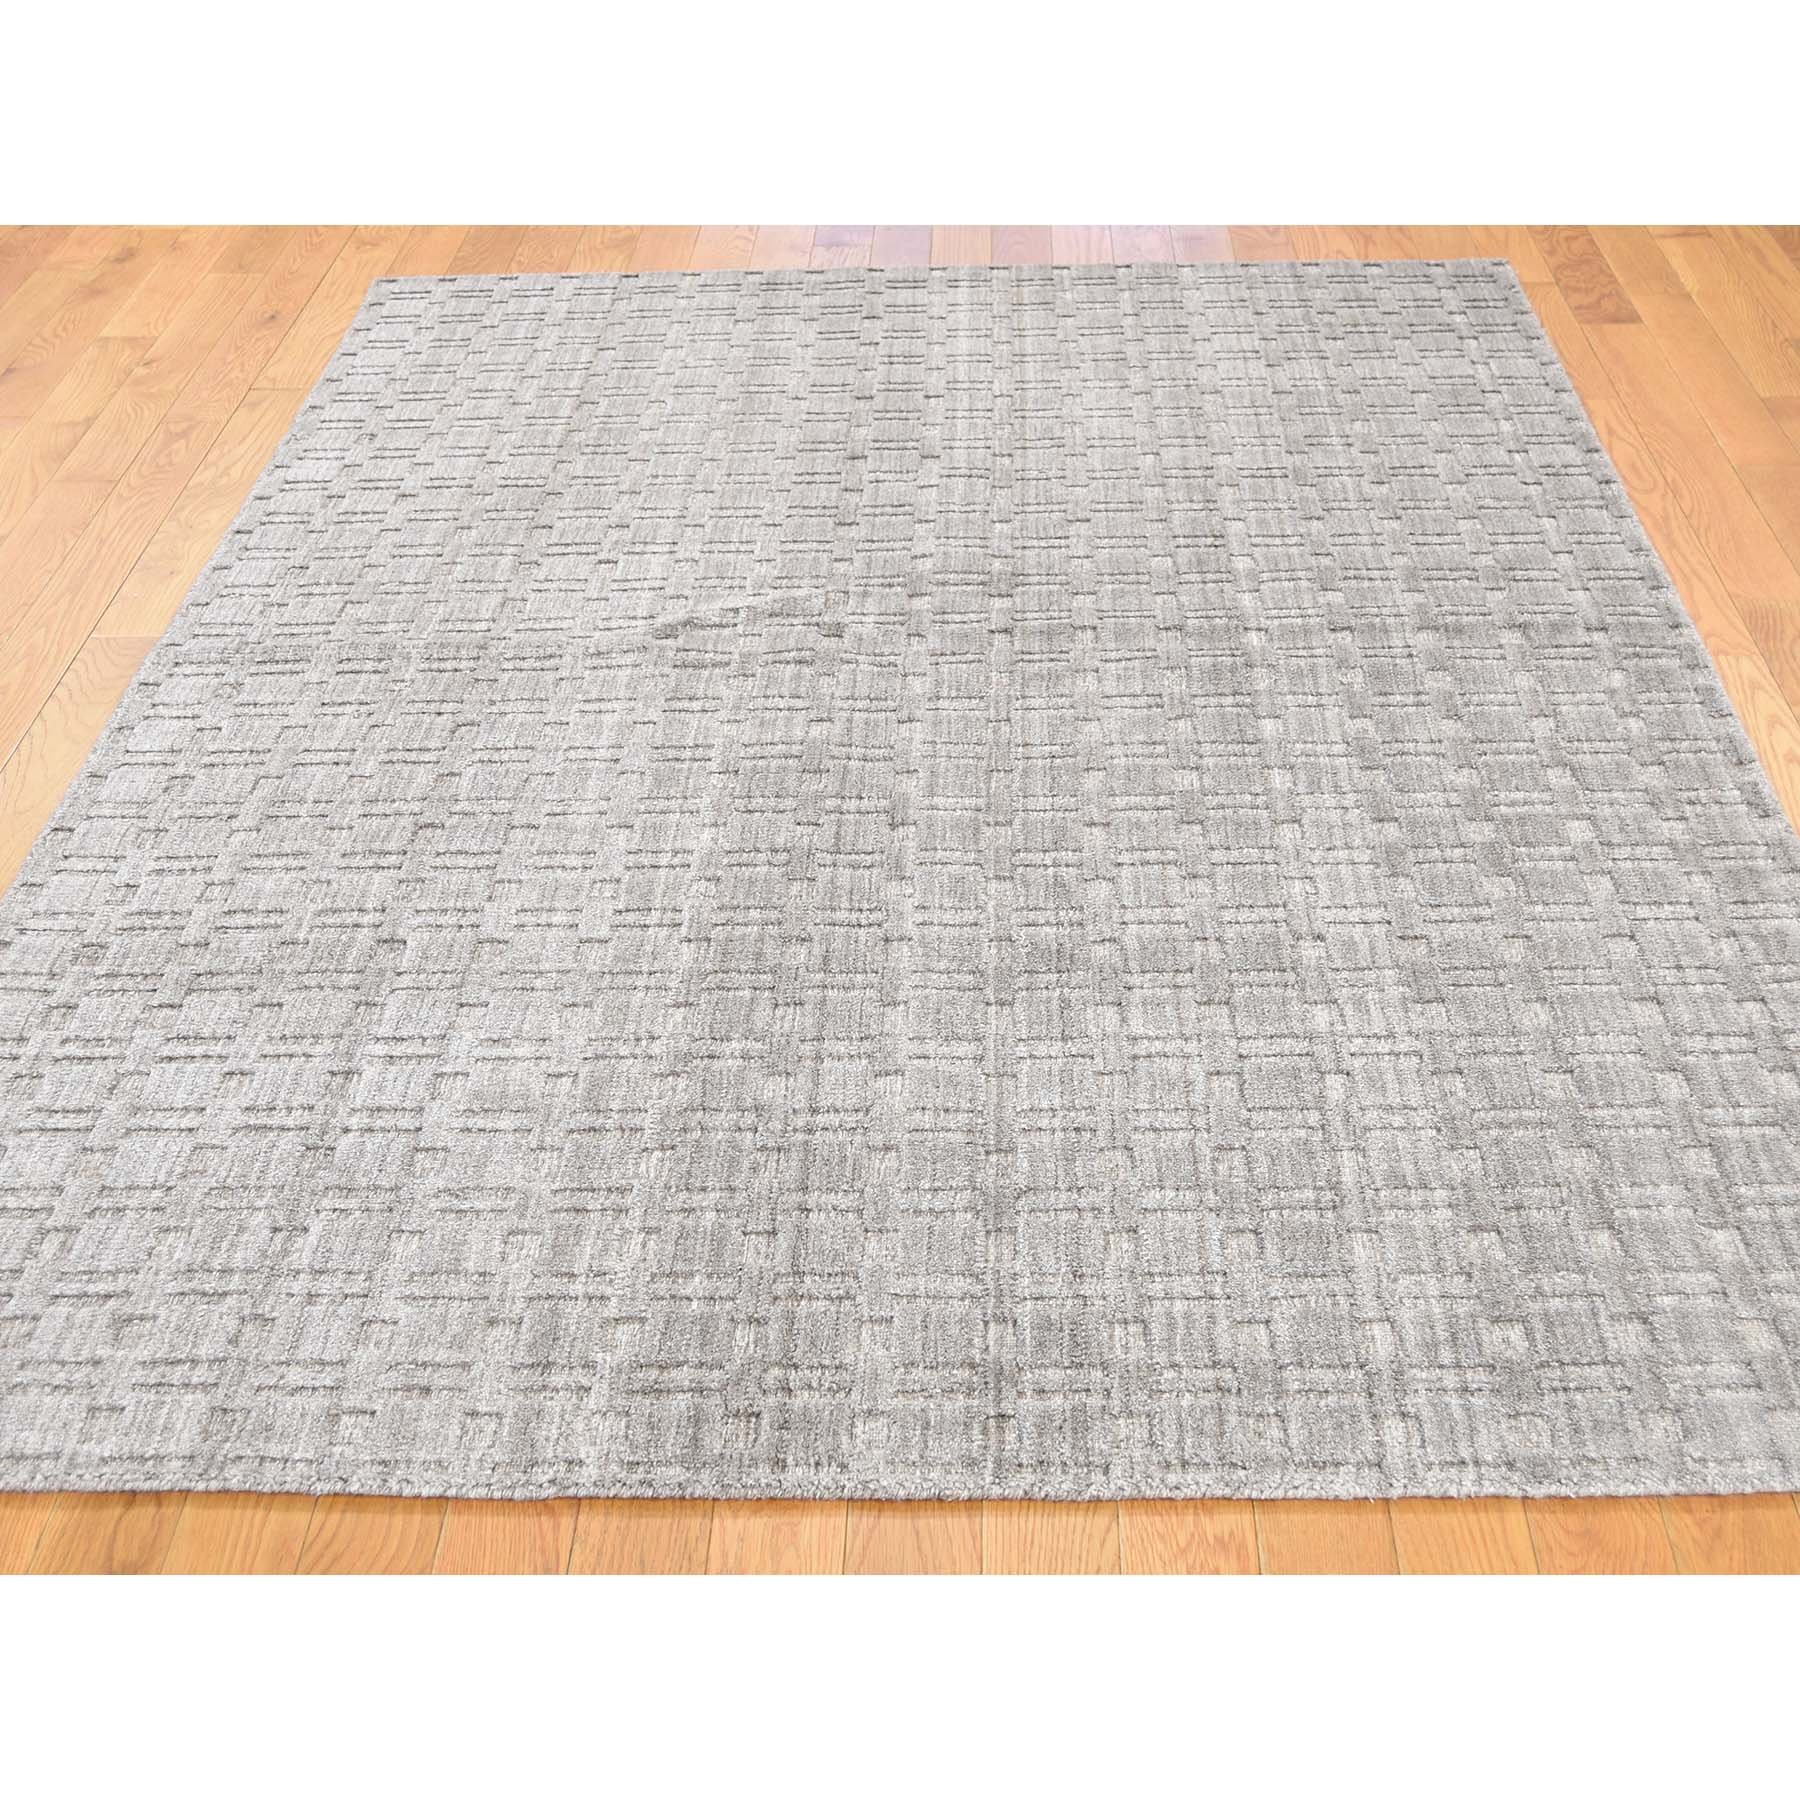 "5'x7'2"" Tone on Tone Pure Wool Hand-Loomed Oriental Rug"